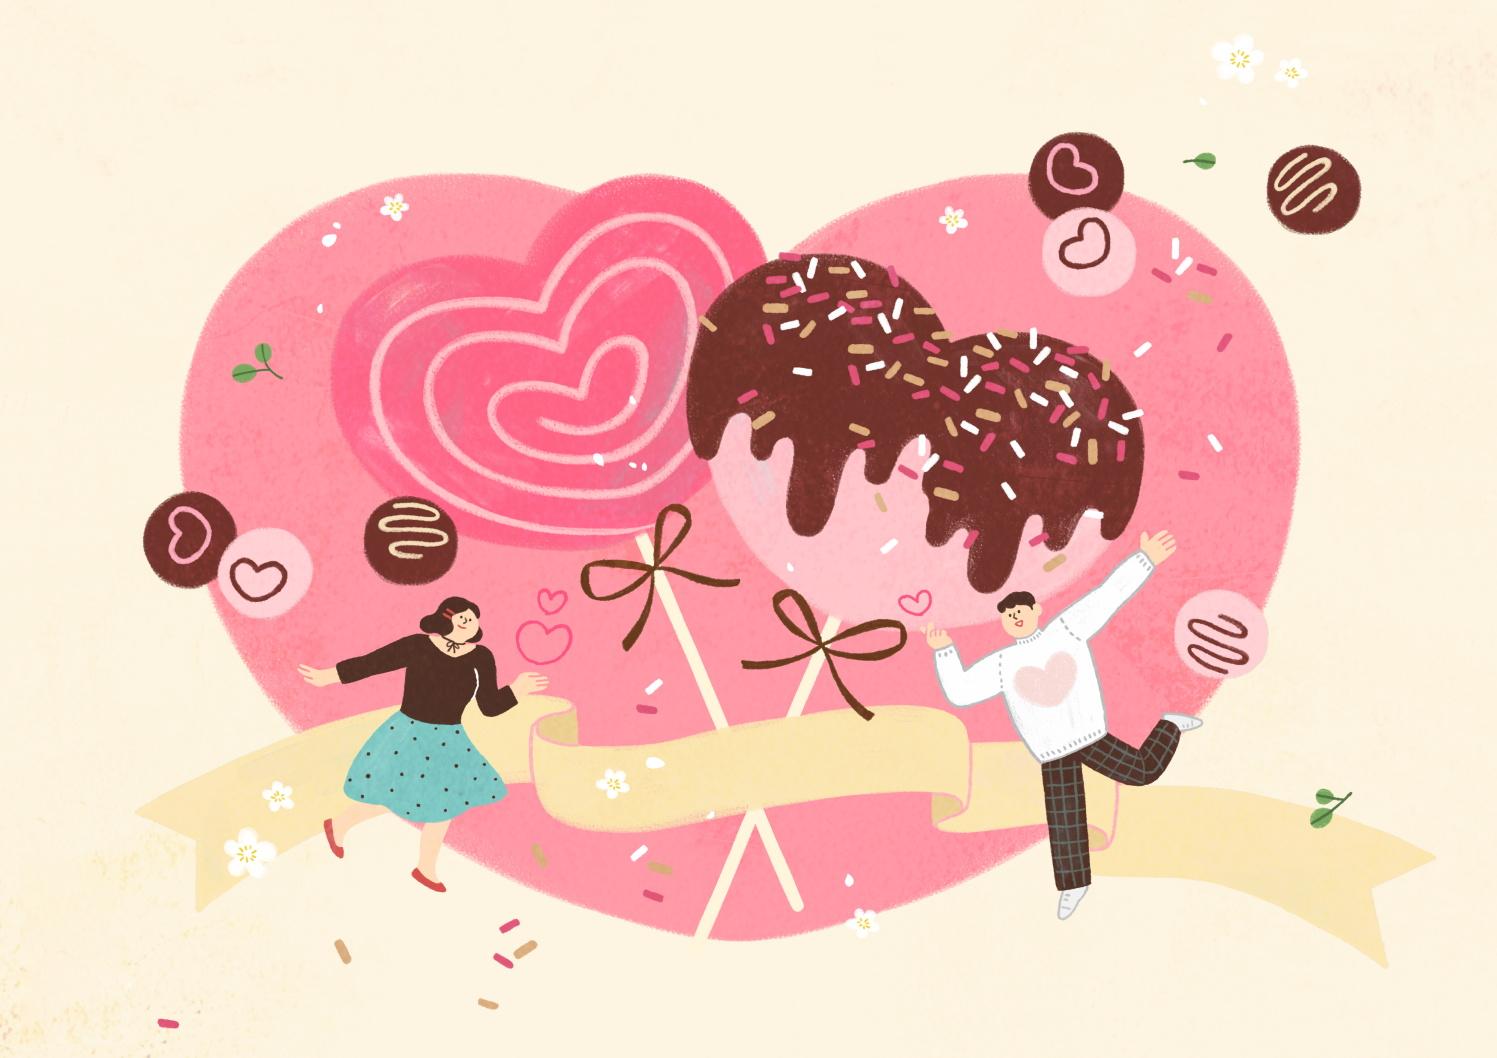 12款情人节七夕情侣手绘插画海报传单设计PSD素材 Valentines Day Couple Hand Drawn Illustration插图1